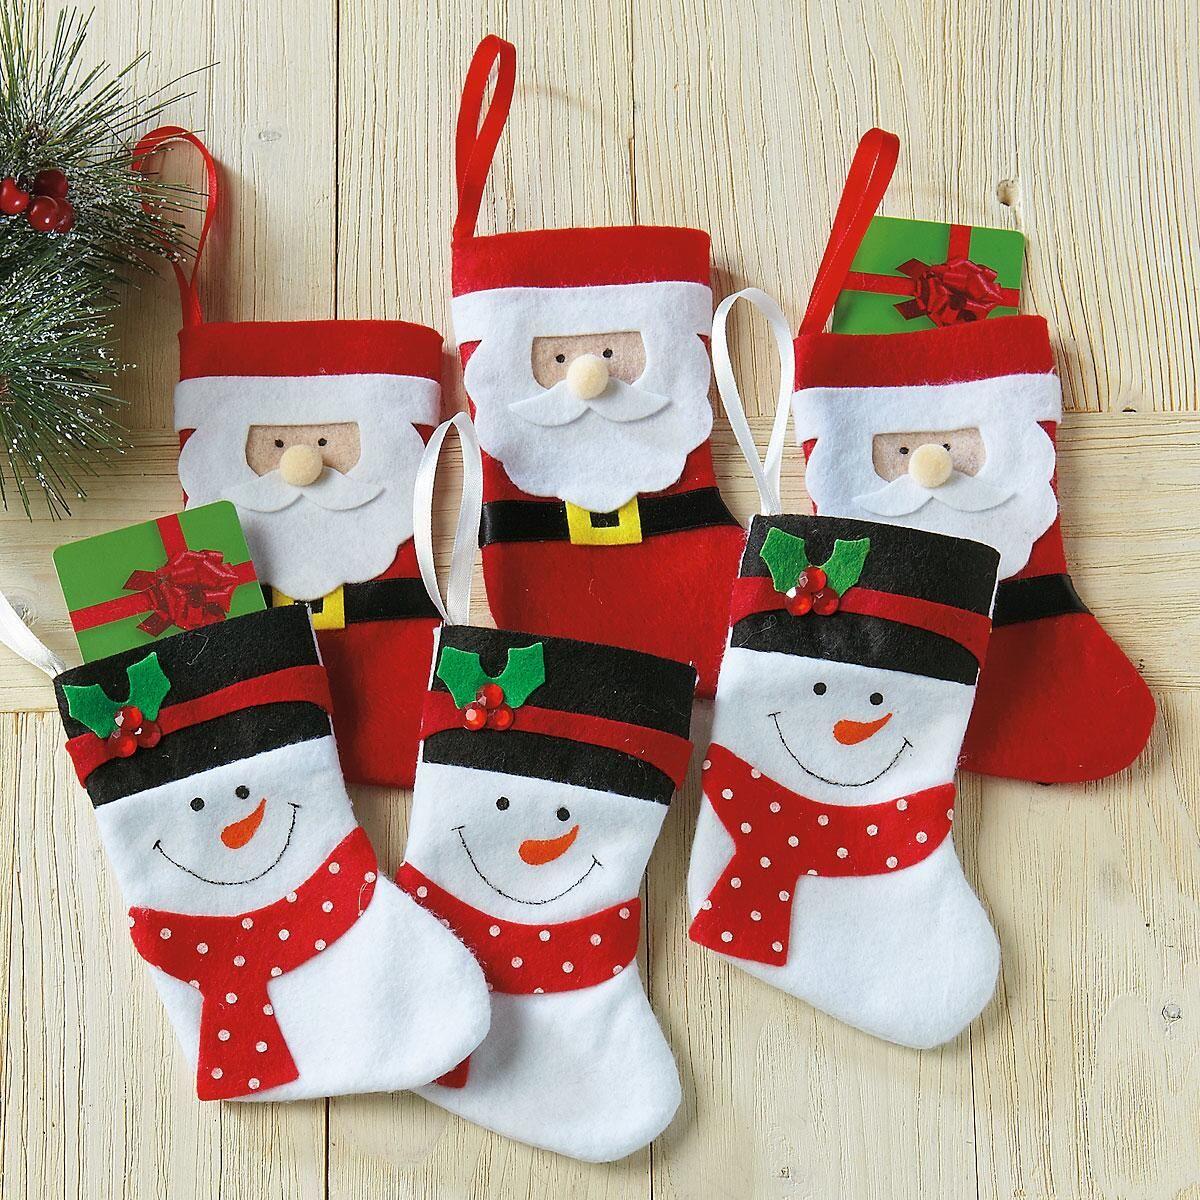 Santa & Snowman Stocking Gift Card Holders